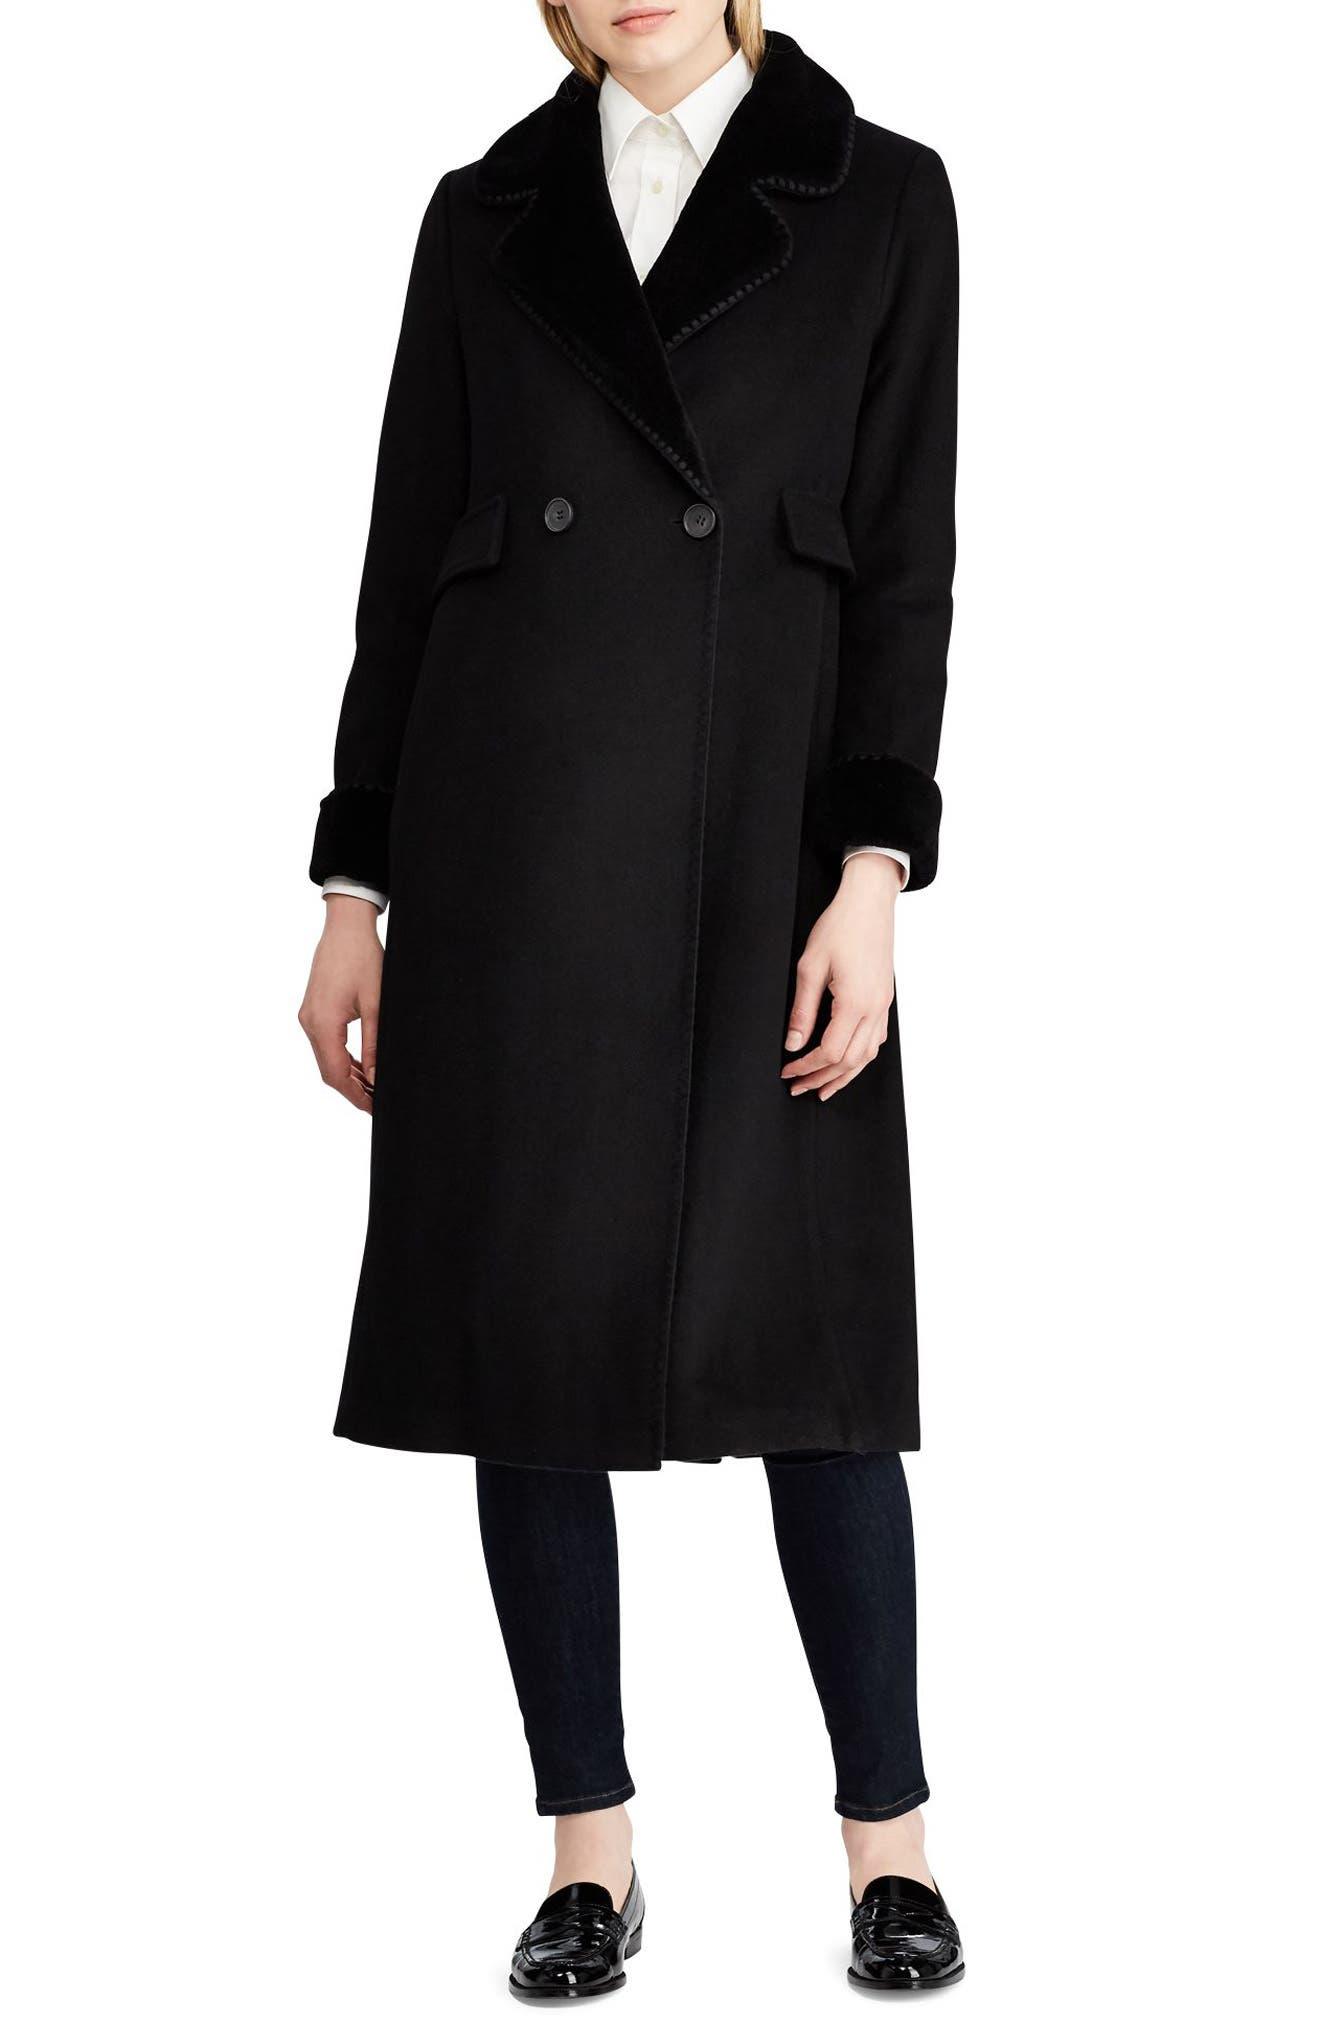 LAUREN RALPH LAUREN Wool Blend Faux Shearling Trim Coat, Main, color, 001